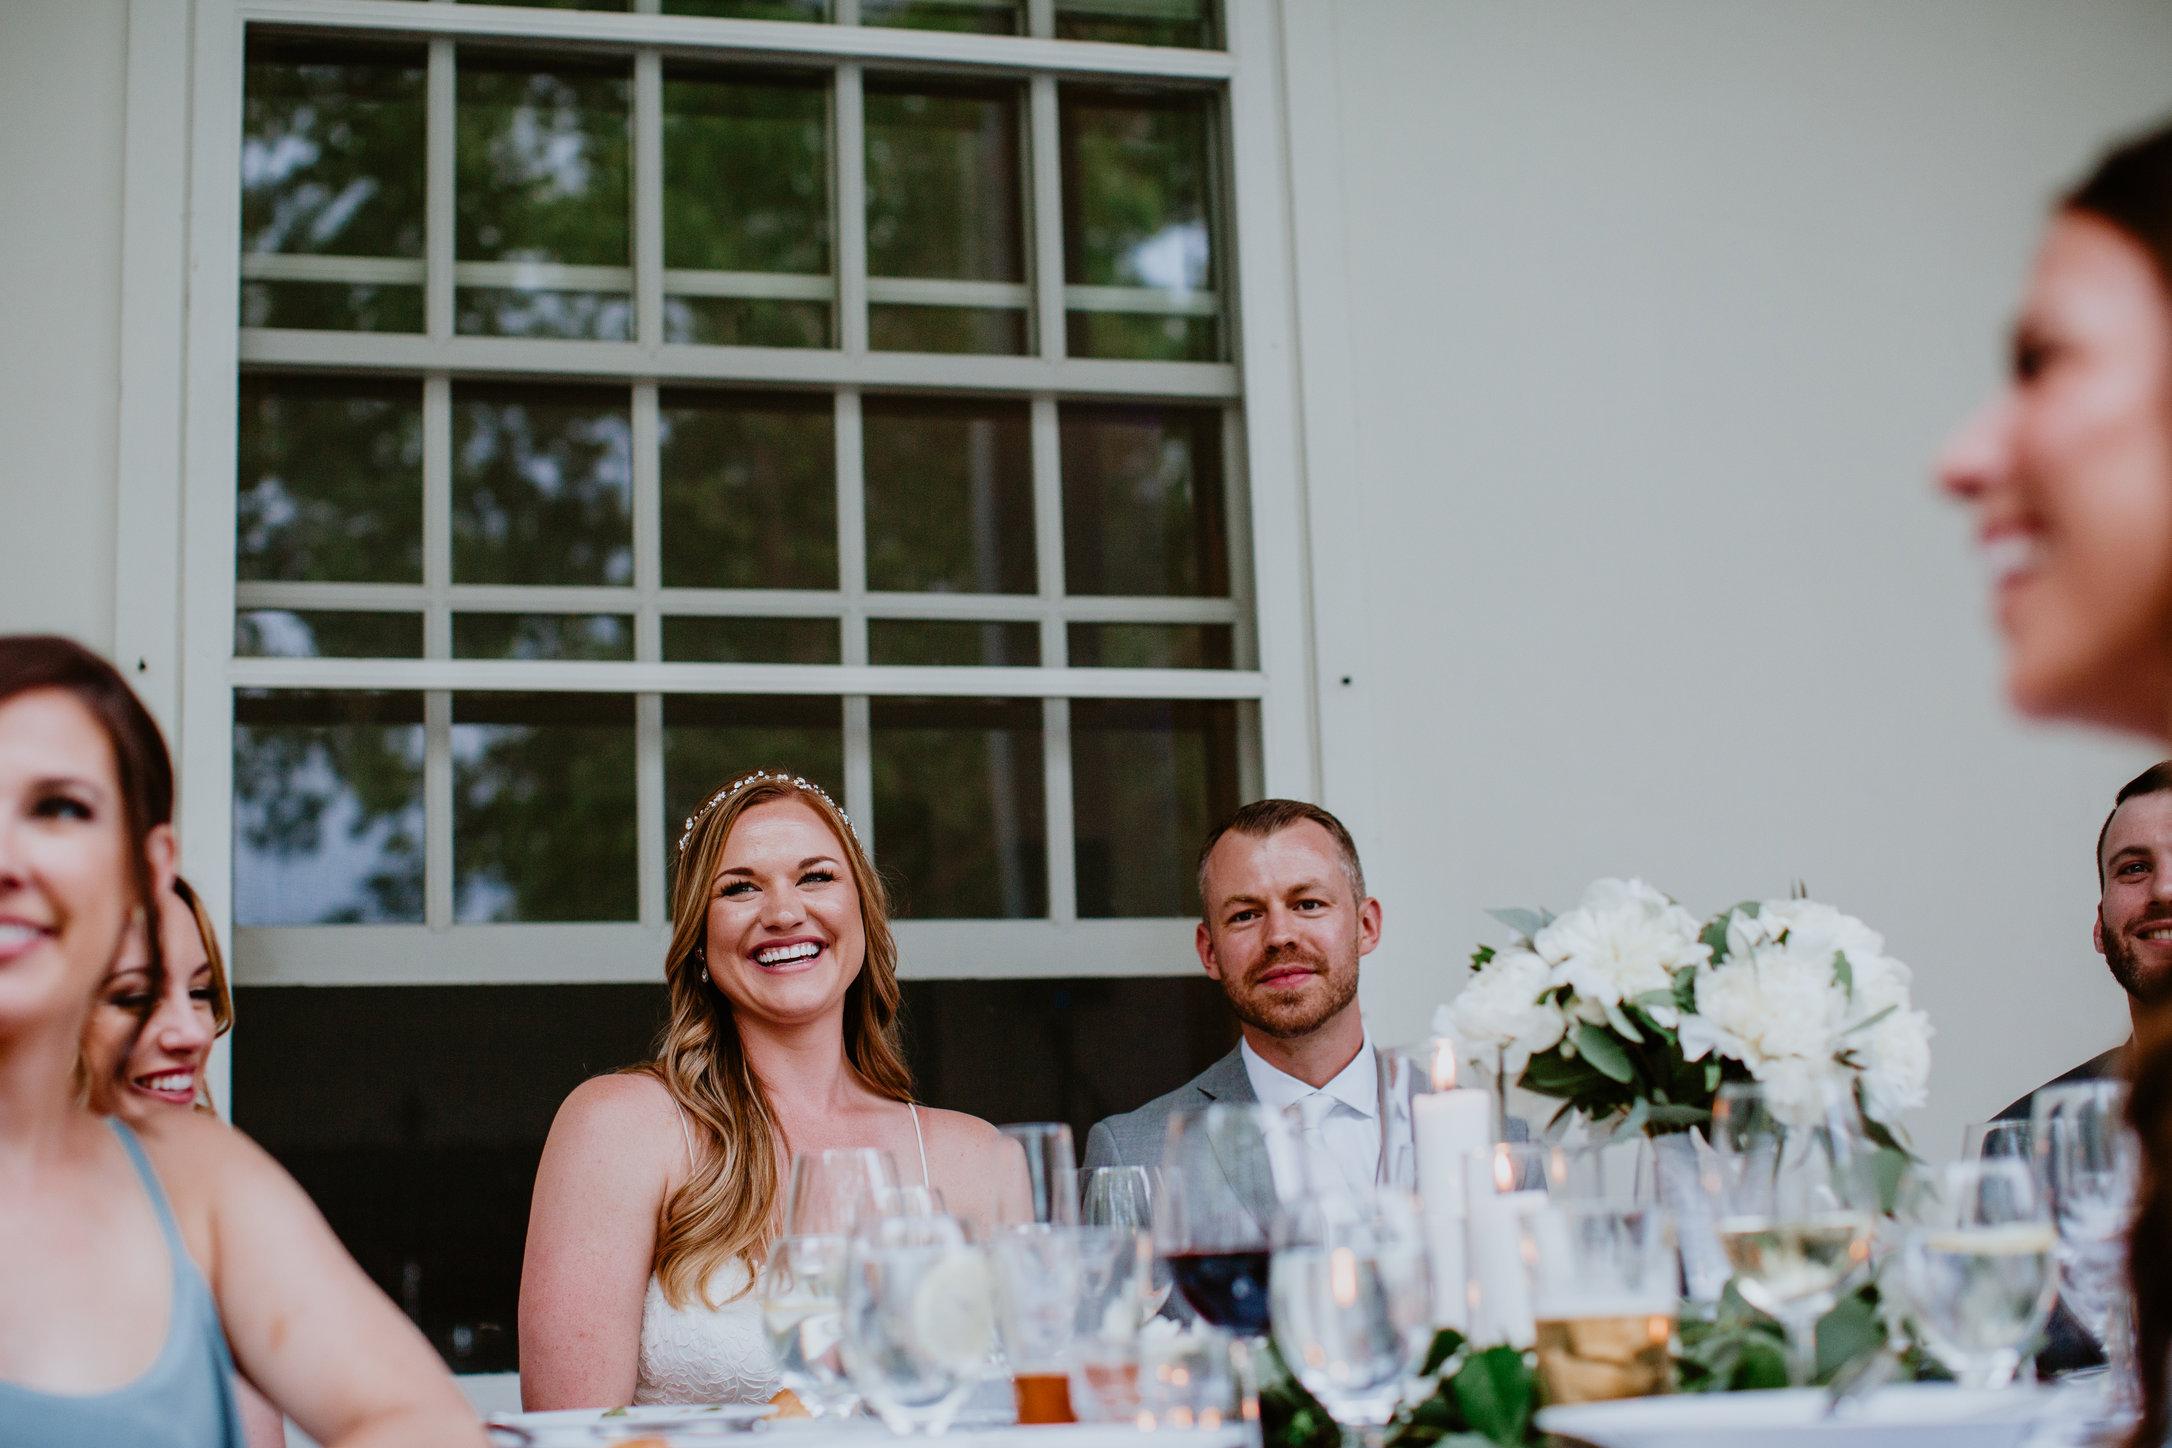 DandA-wedding-613.jpg